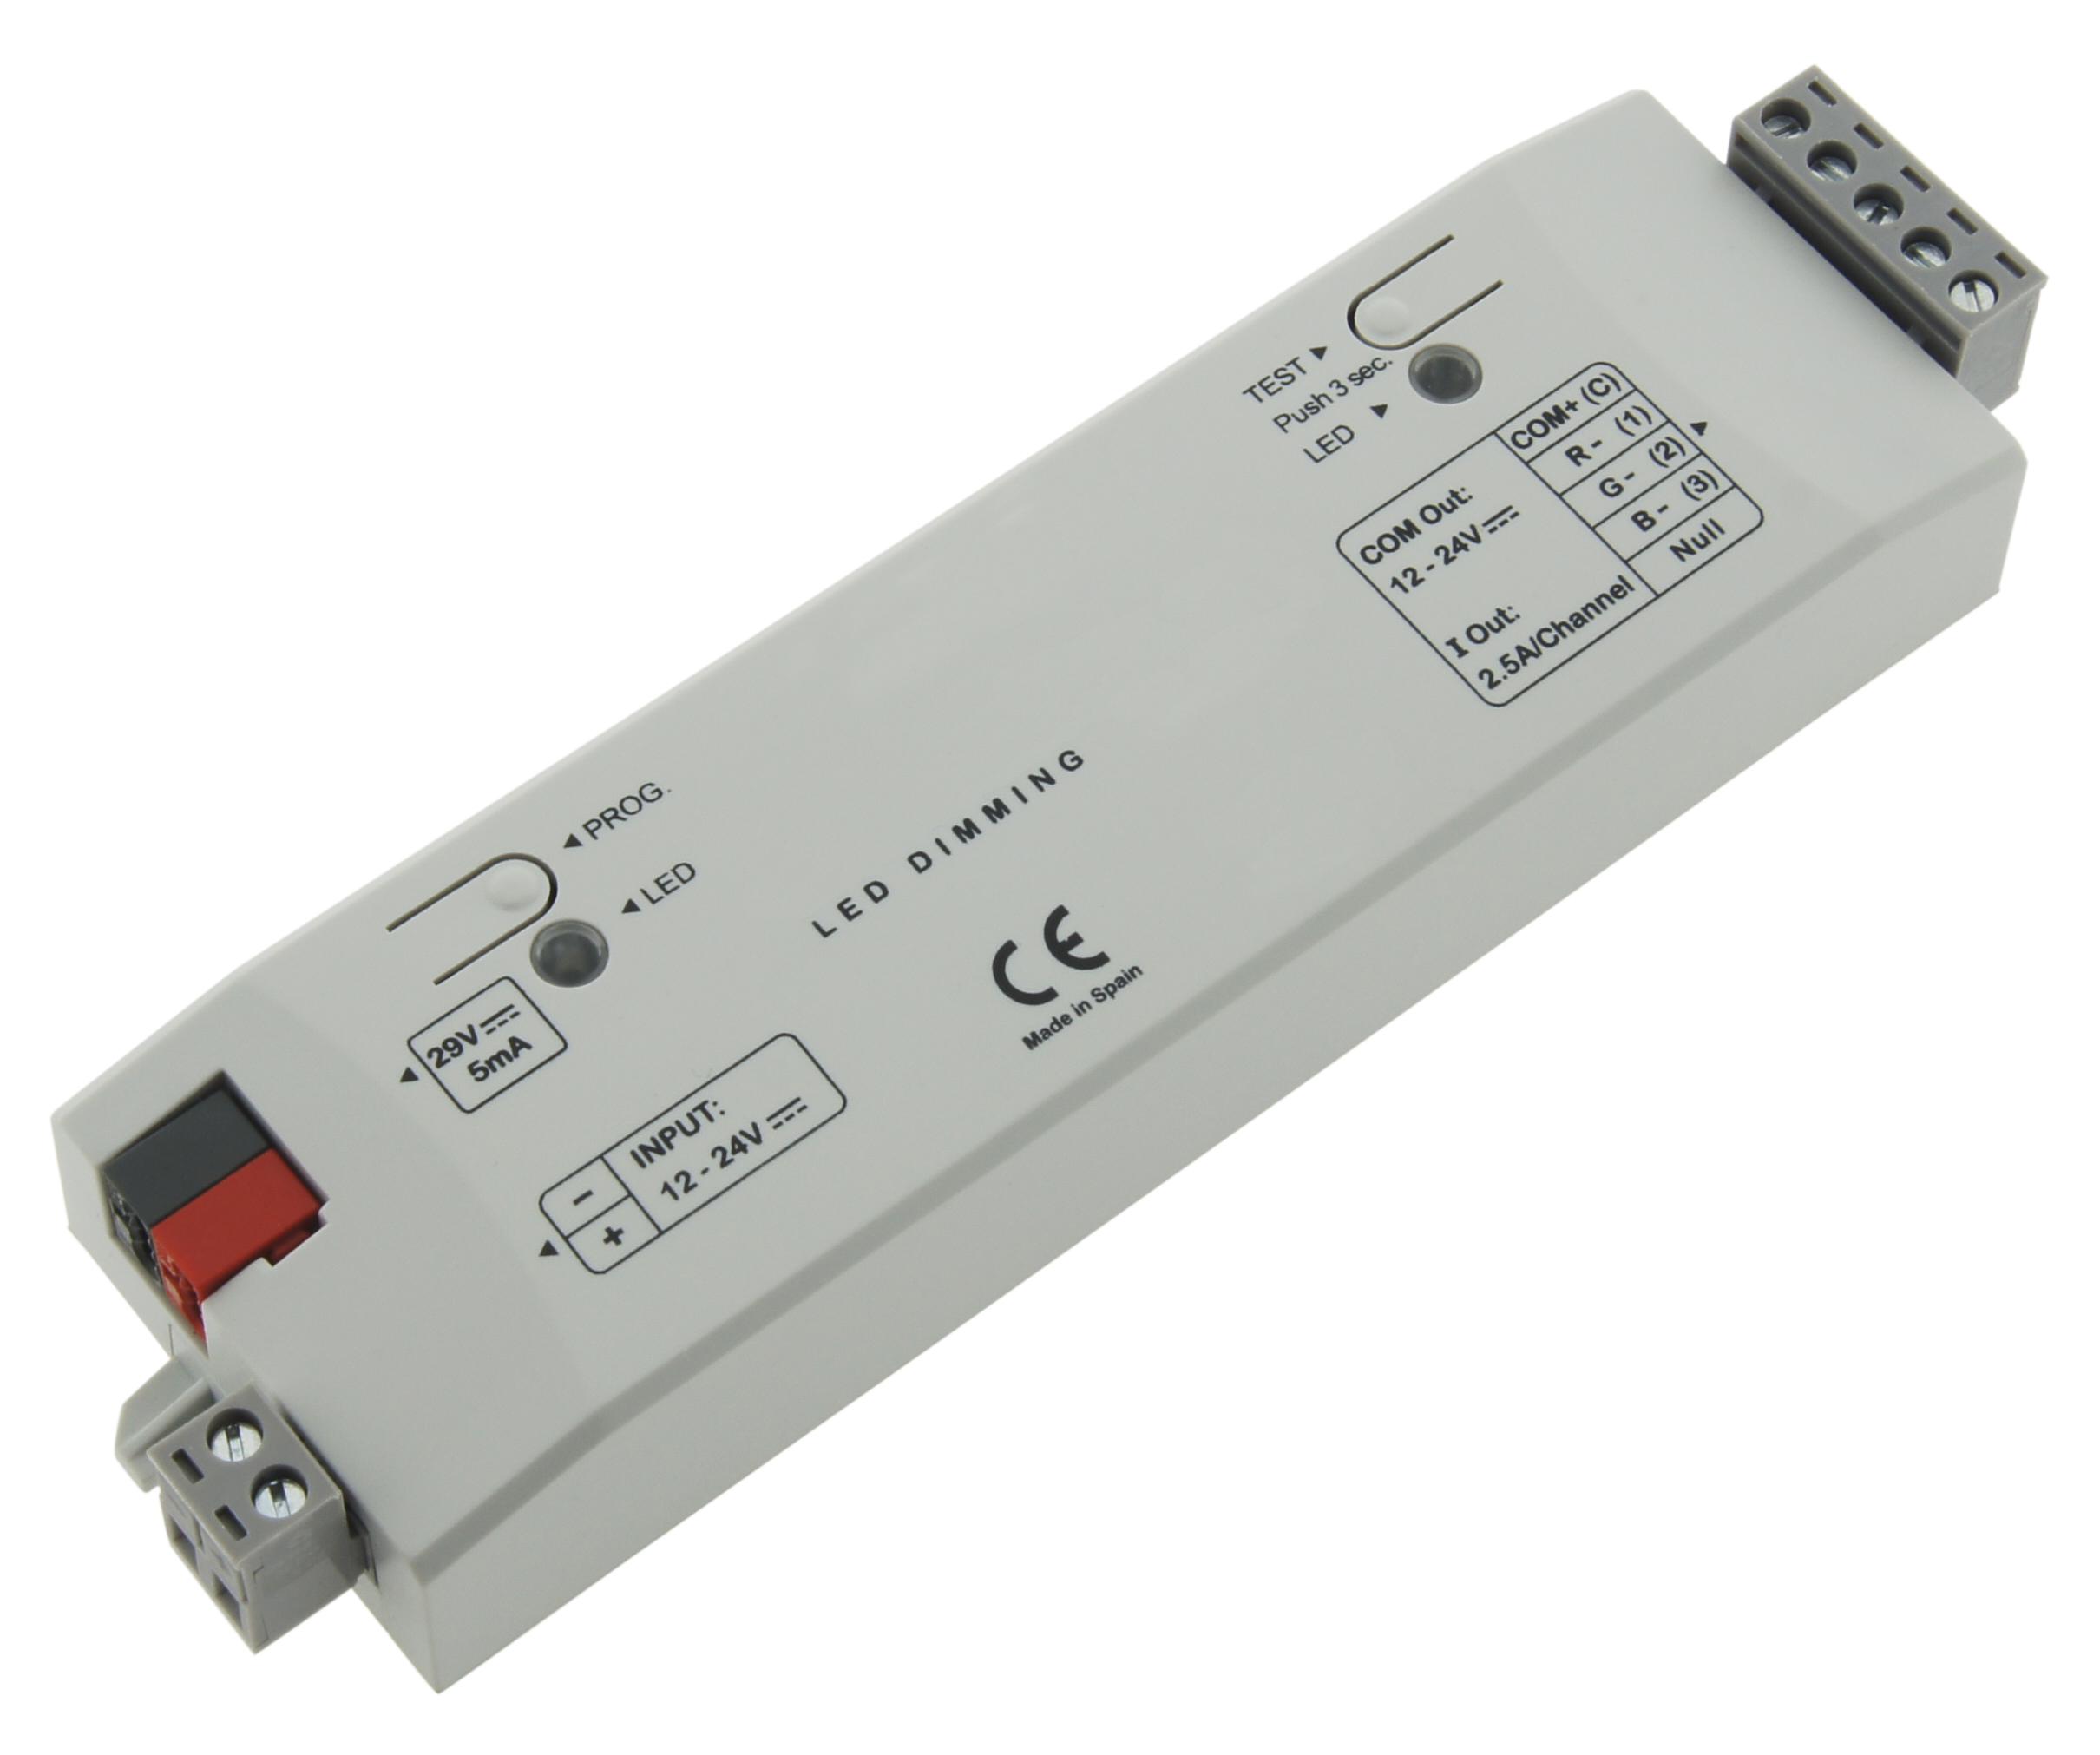 1 Stk KNX RGB LED Dimmer LILC013003